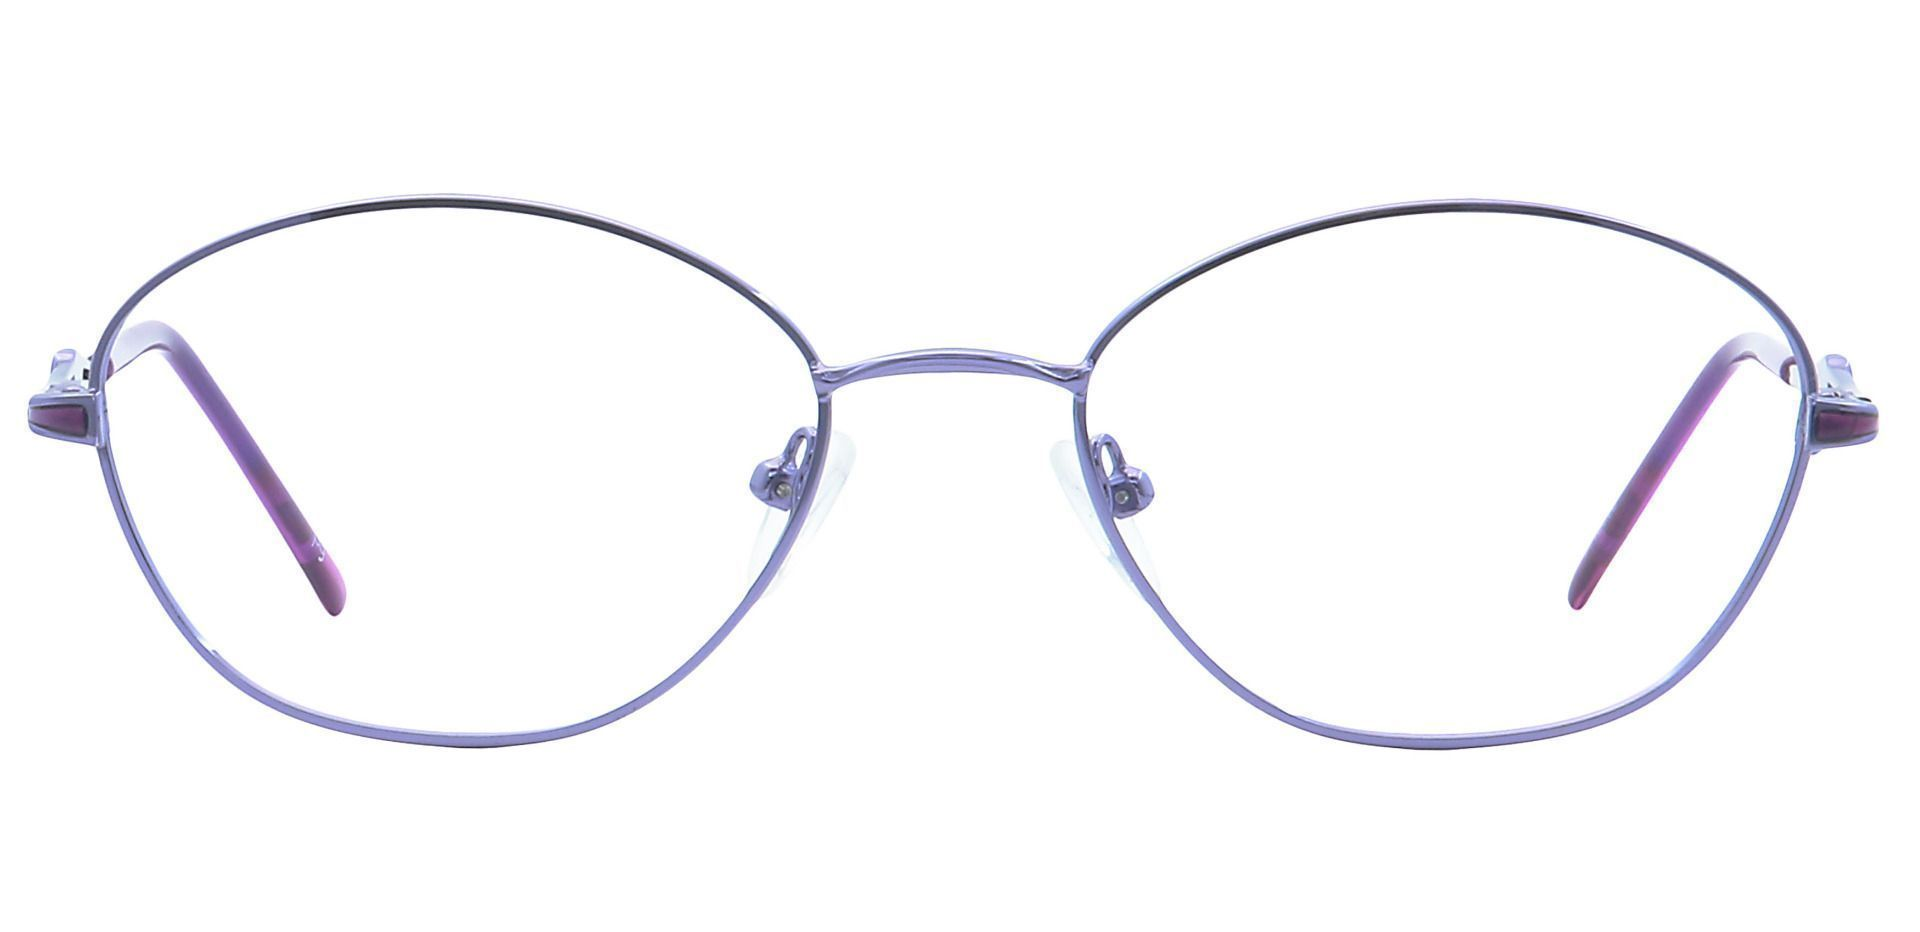 Emily Round Blue Light Blocking Glasses - Clear